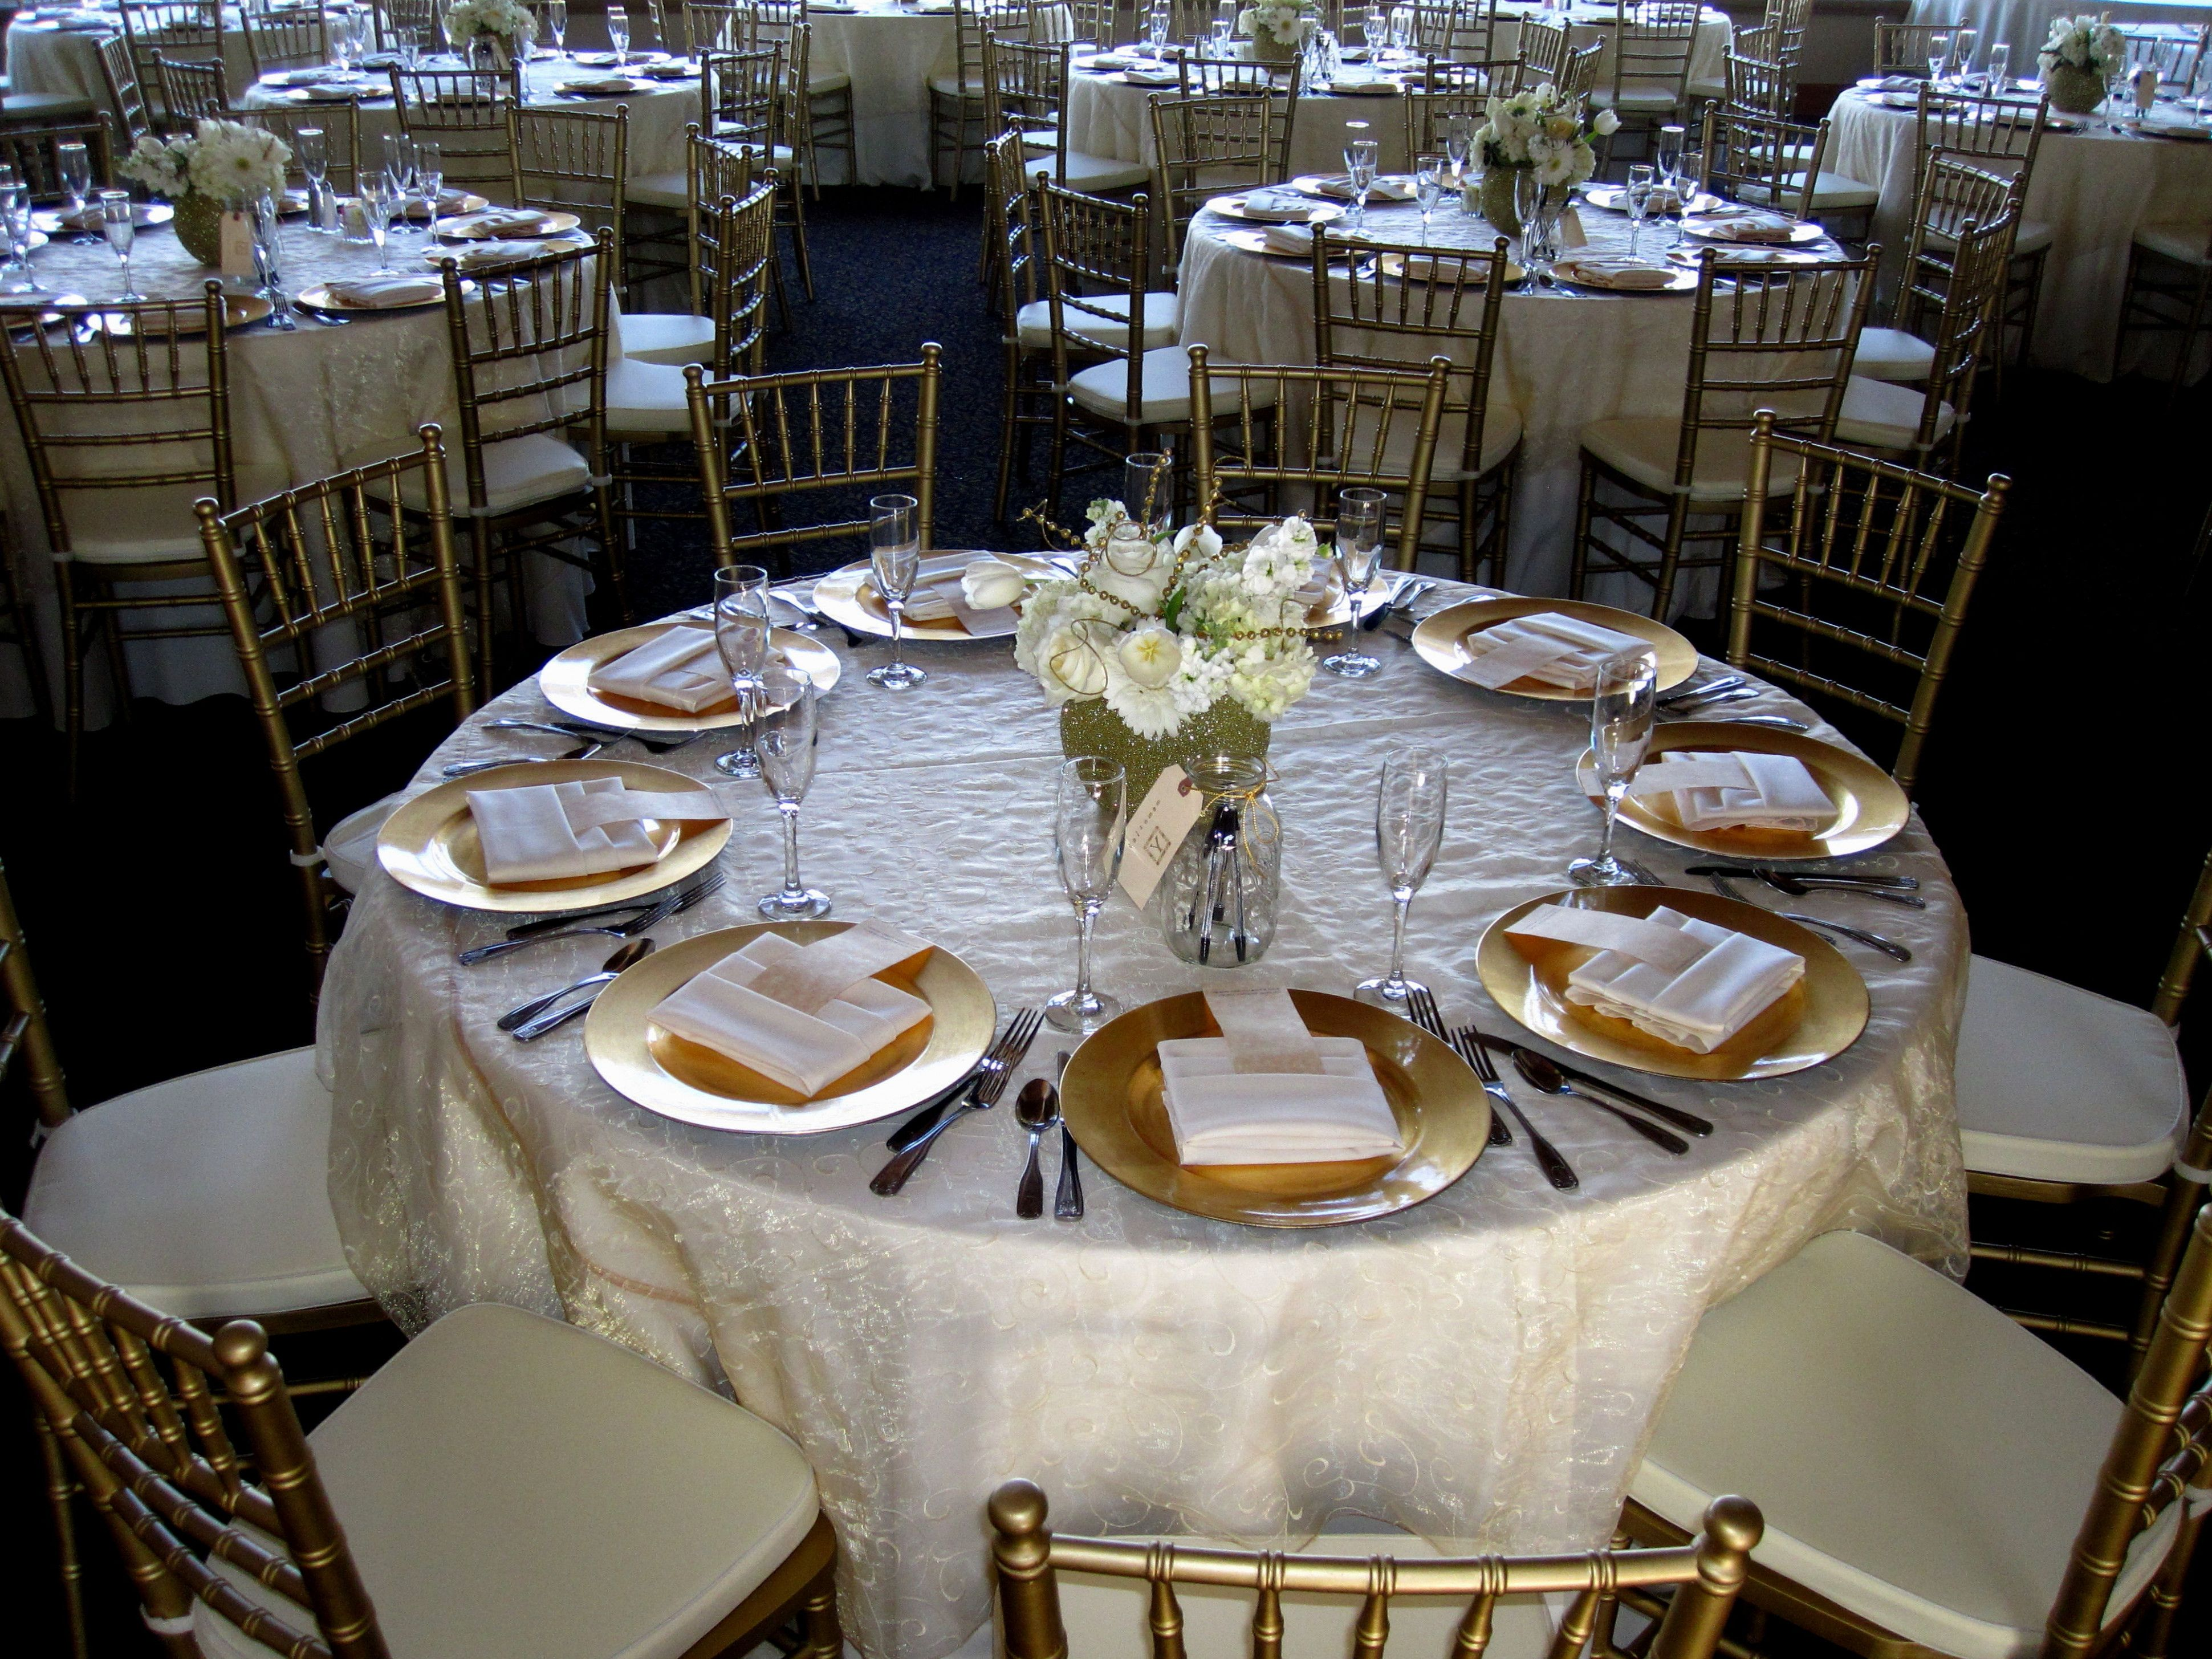 Decoration ideas for 50th wedding anniversary celebration  Wedding Reception Centerpieces For Round Tables  beach wedding hair